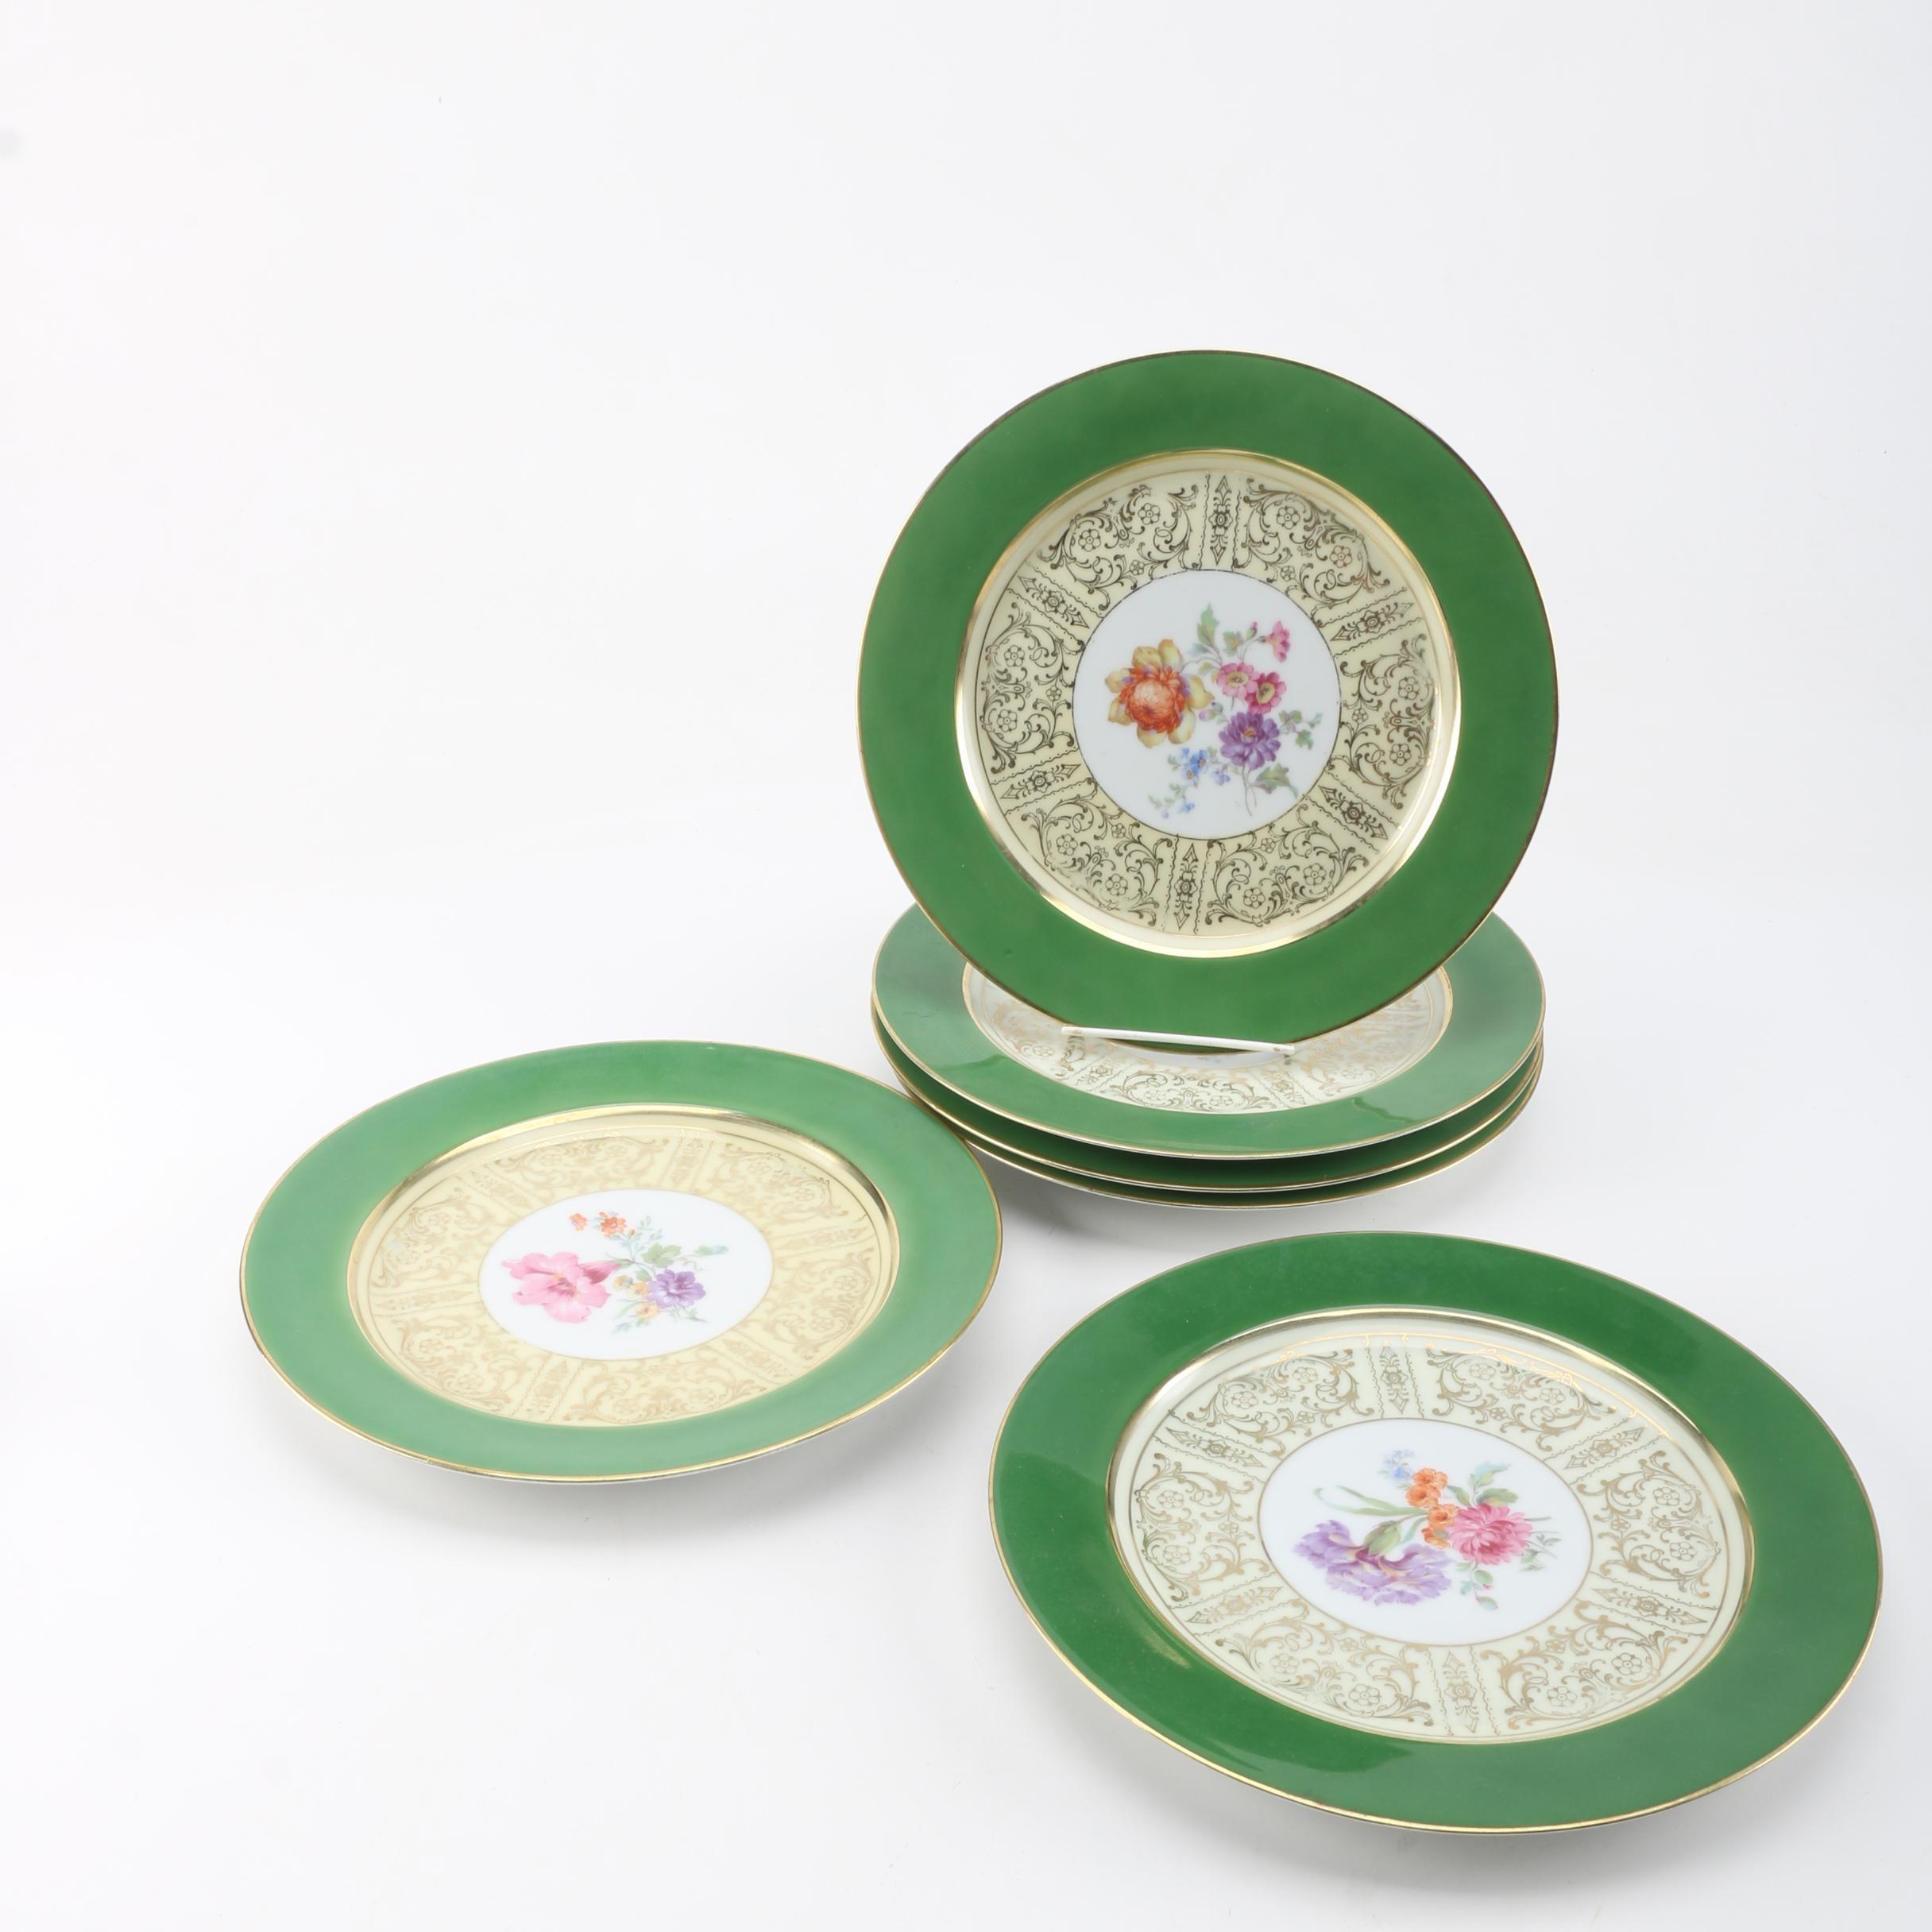 Vintage Tirschenreuth Porcelain Plates ca. 1927-69